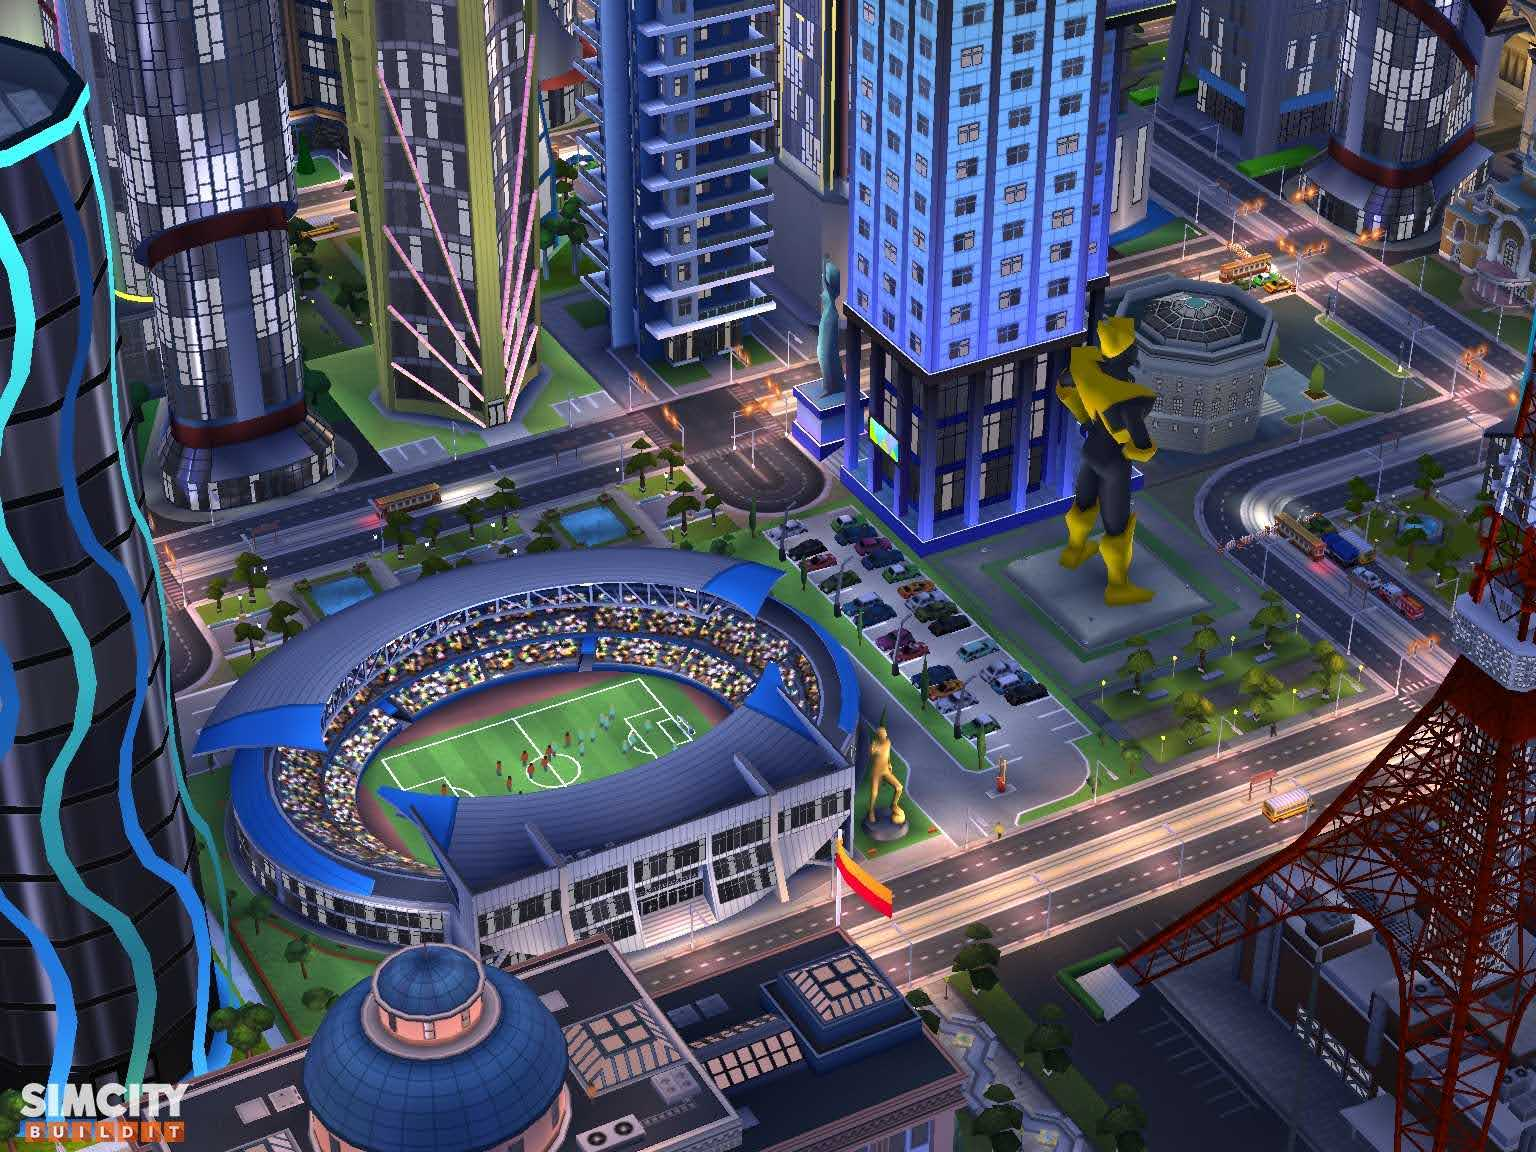 Soccer Stadium and MaxisMan Statue